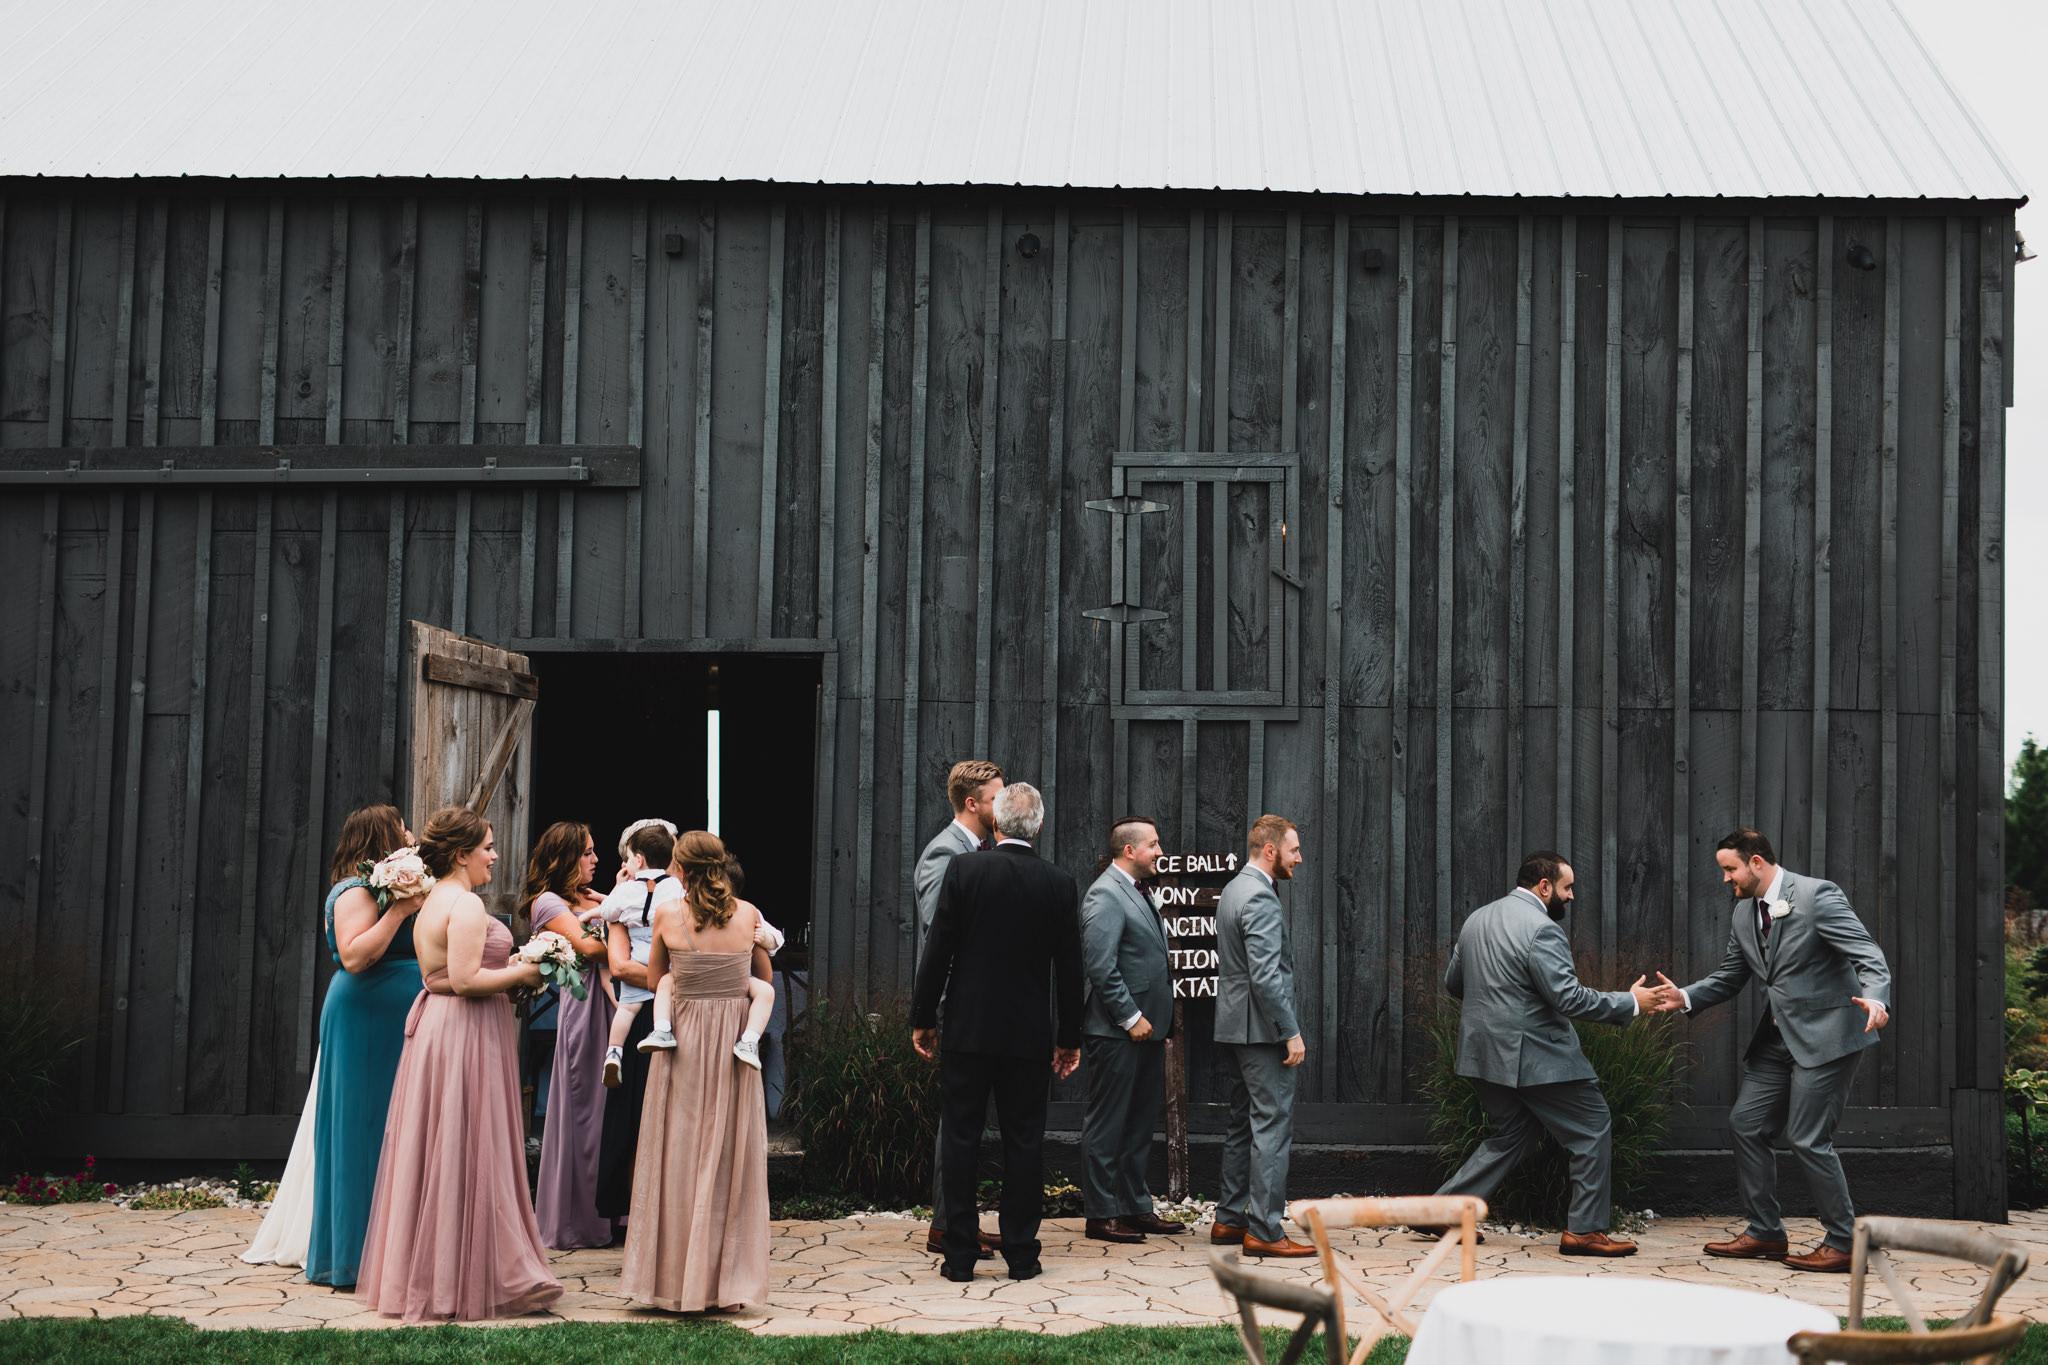 341-WEB-Jonathan-Kuhn-Photography-Rebecca-Marc-Wedding-3314.jpg